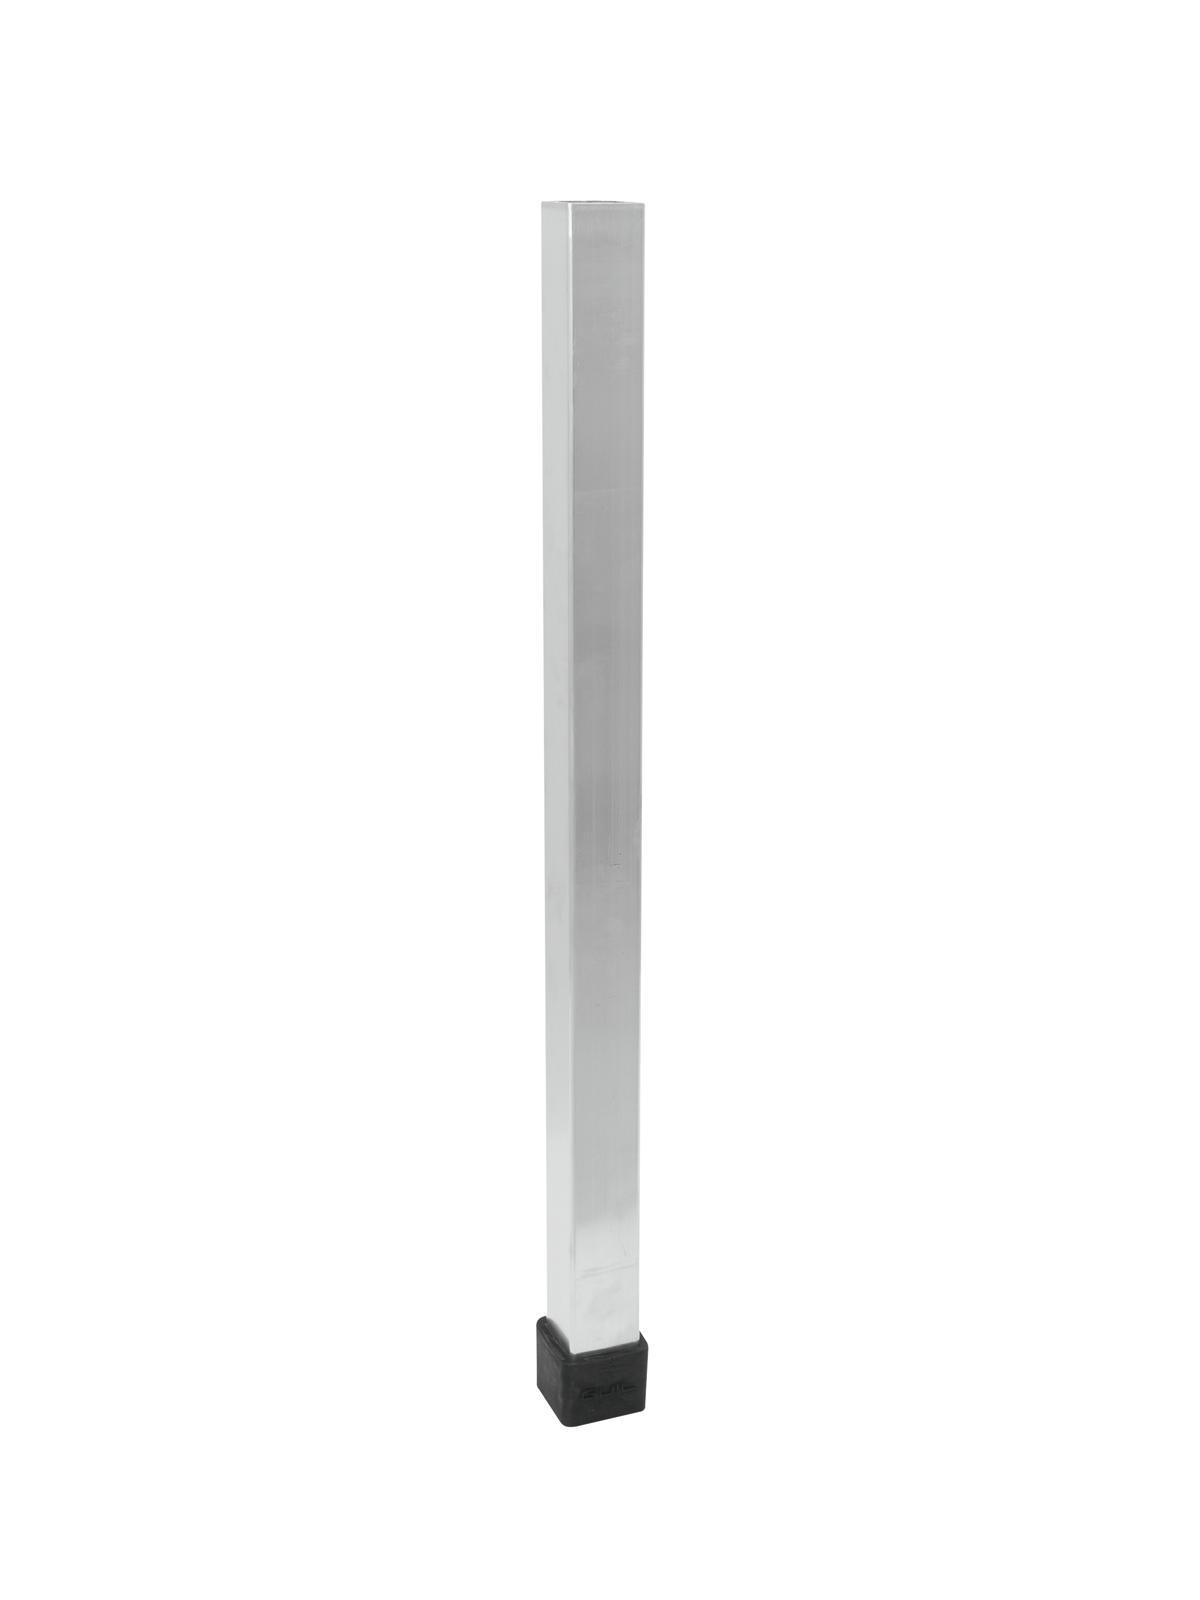 GUIL PTA-440/80 piede Fisso